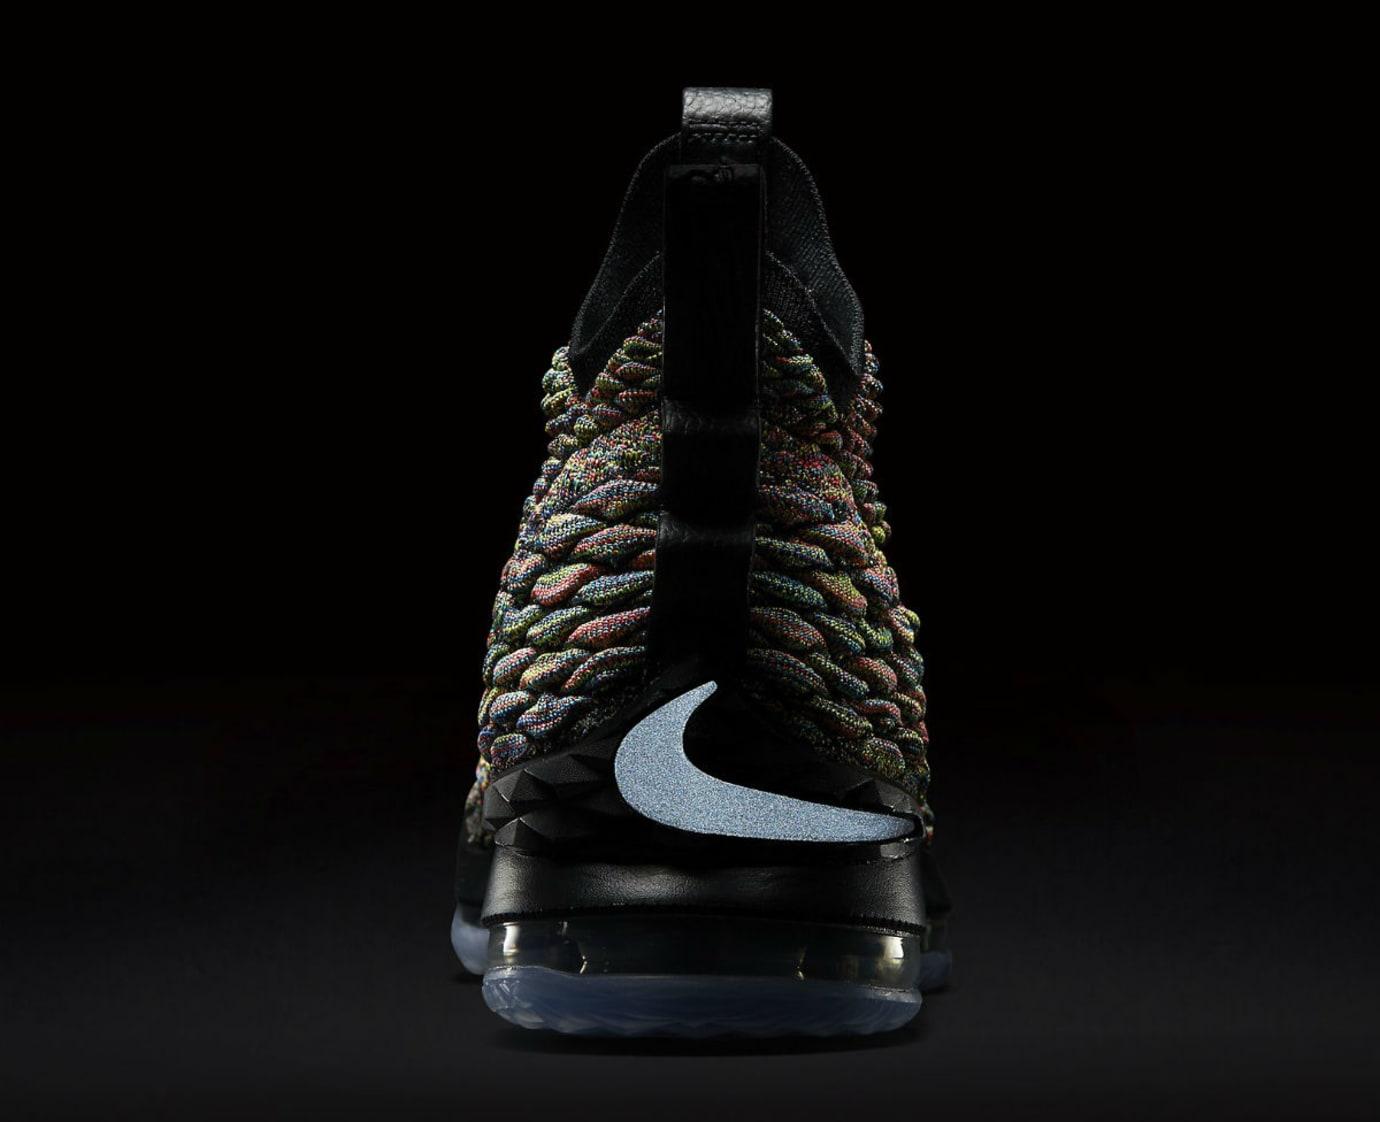 328035e628f Nike LeBron 15 XV Four Horsemen Black Fruity Pebbles Release Date  897648-901 3M